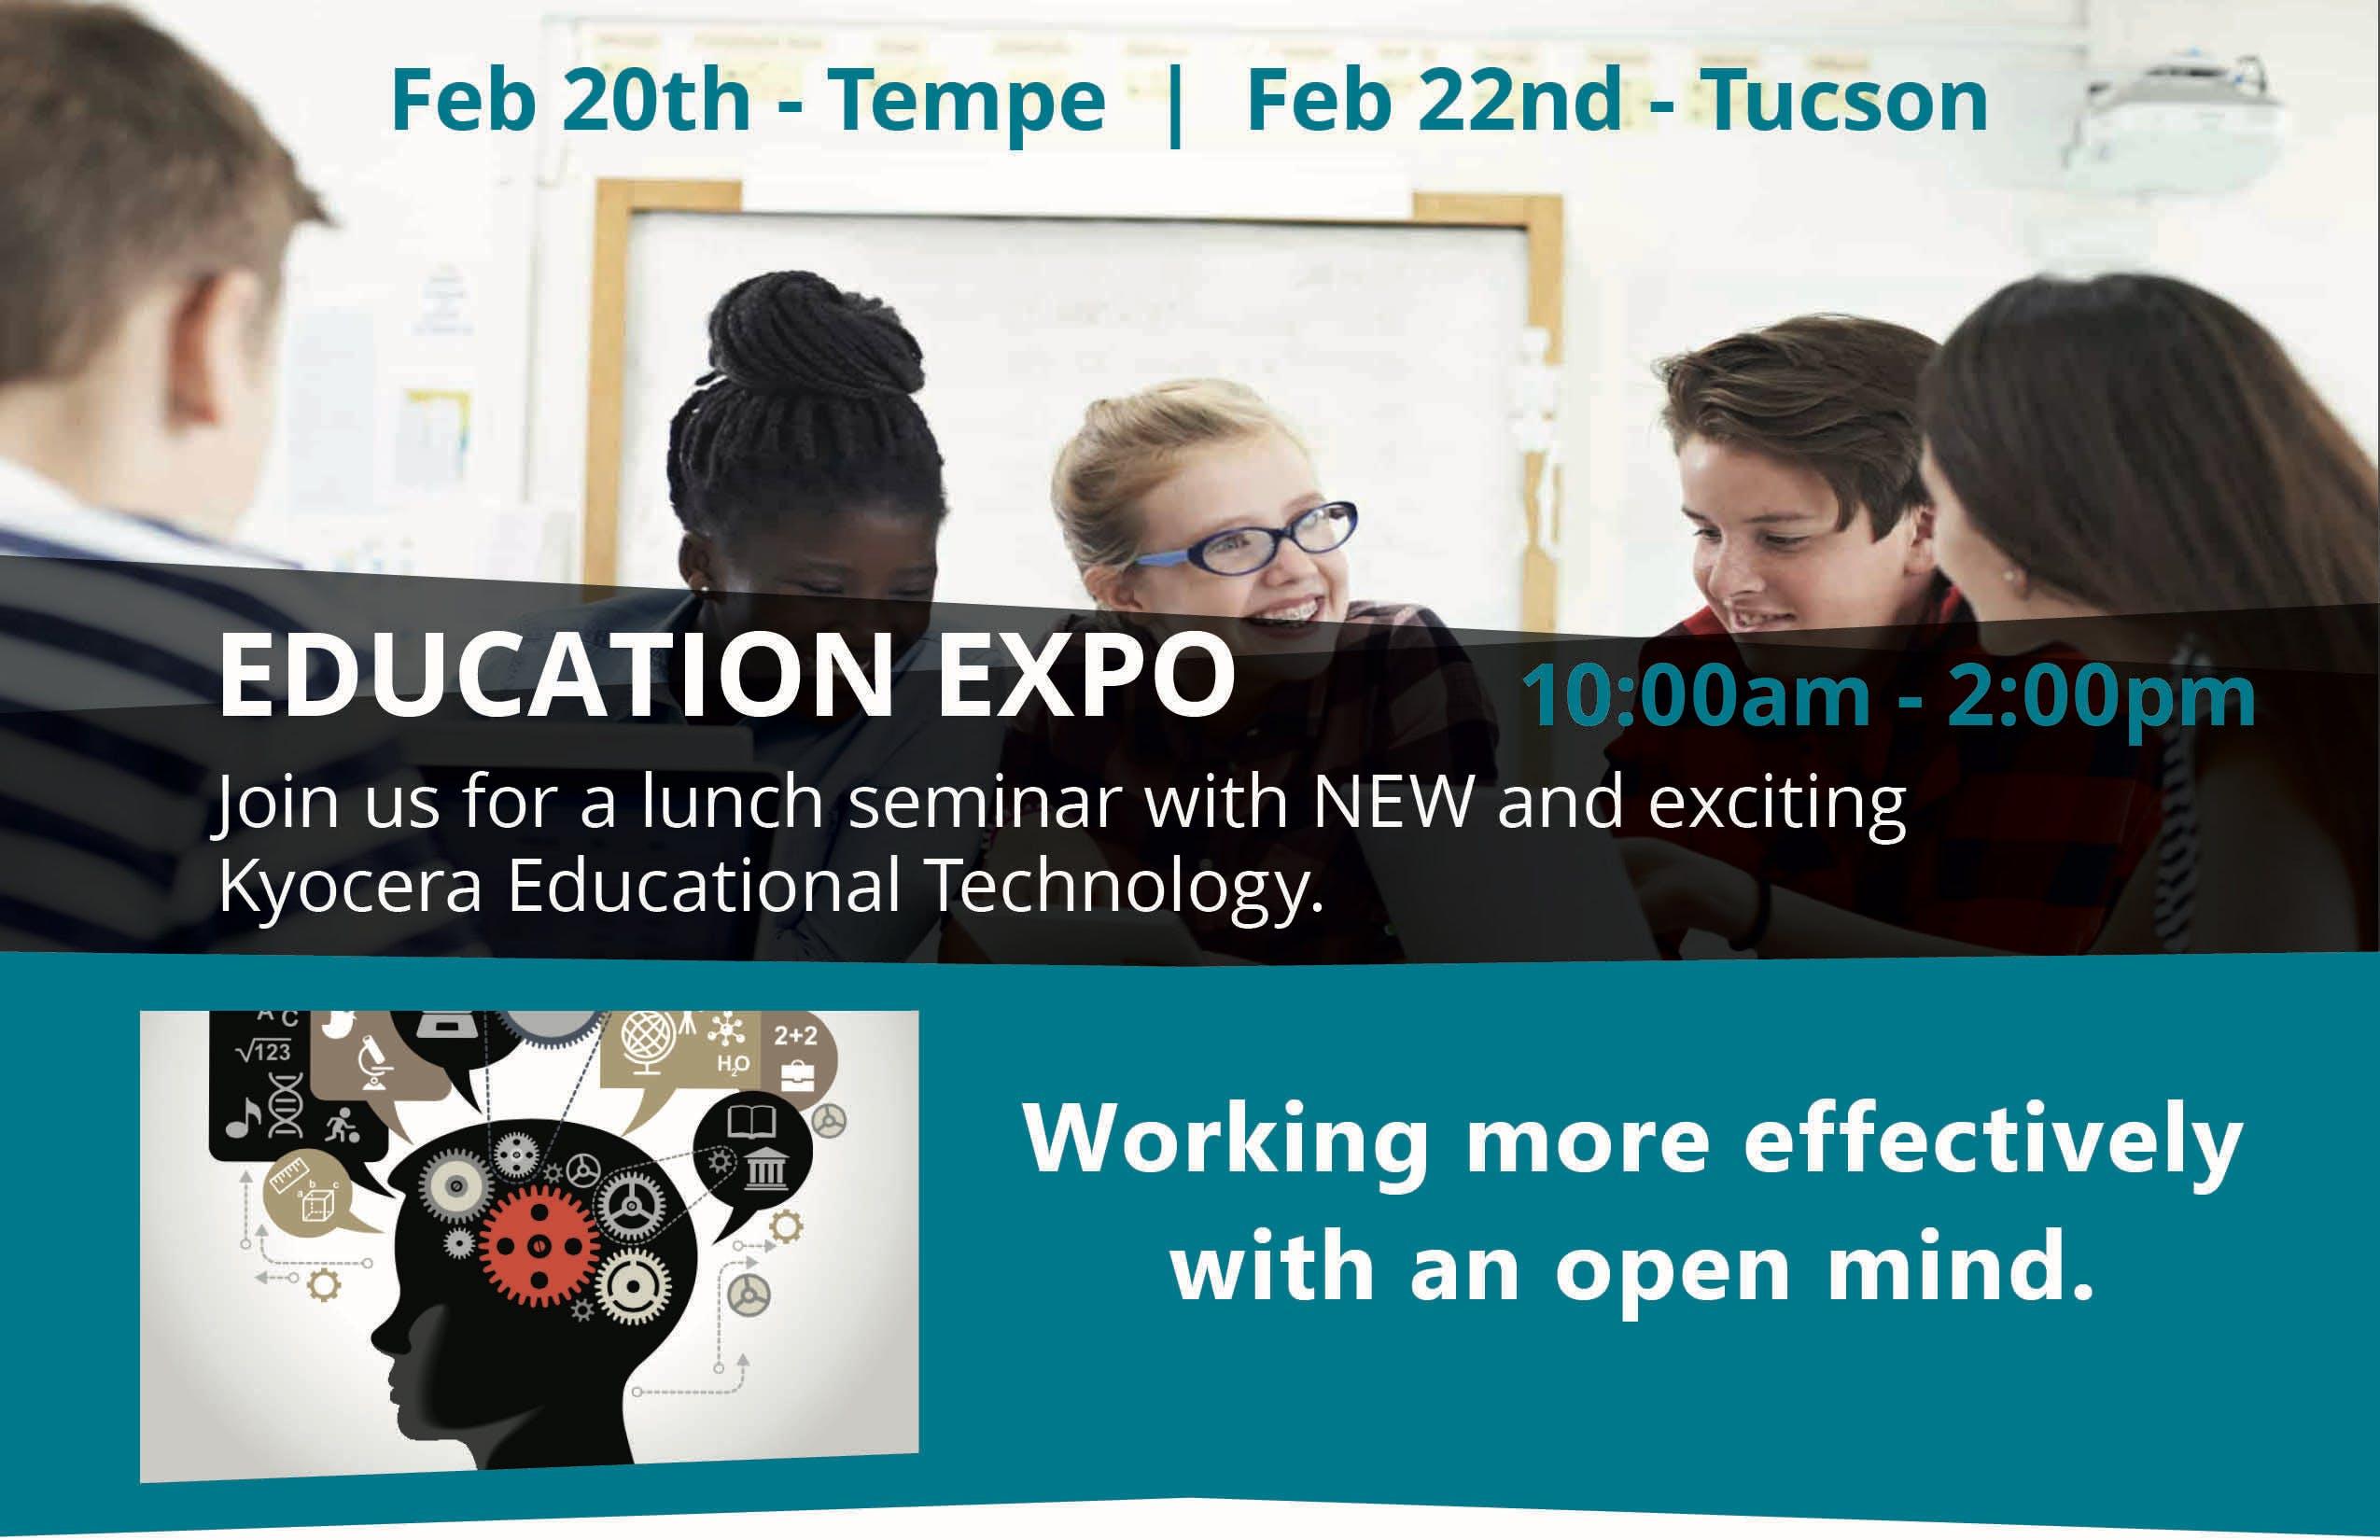 KDS West - Education Expo Tempe